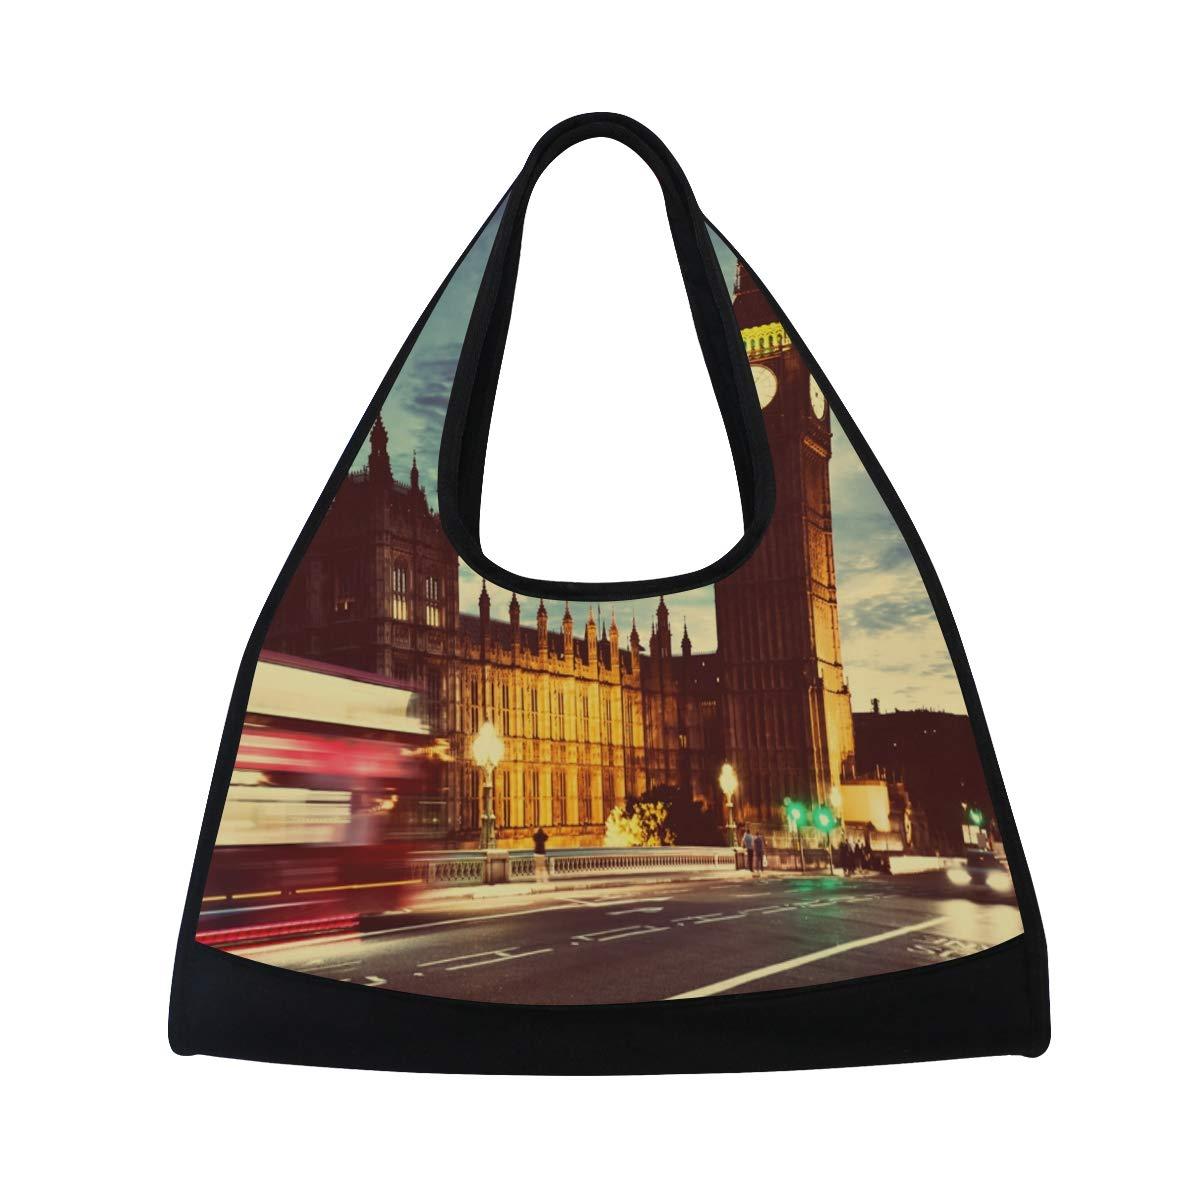 The Big Ben Clock Women Sports Gym Totes Bag Multi-Function Nylon Travel Shoulder Bag